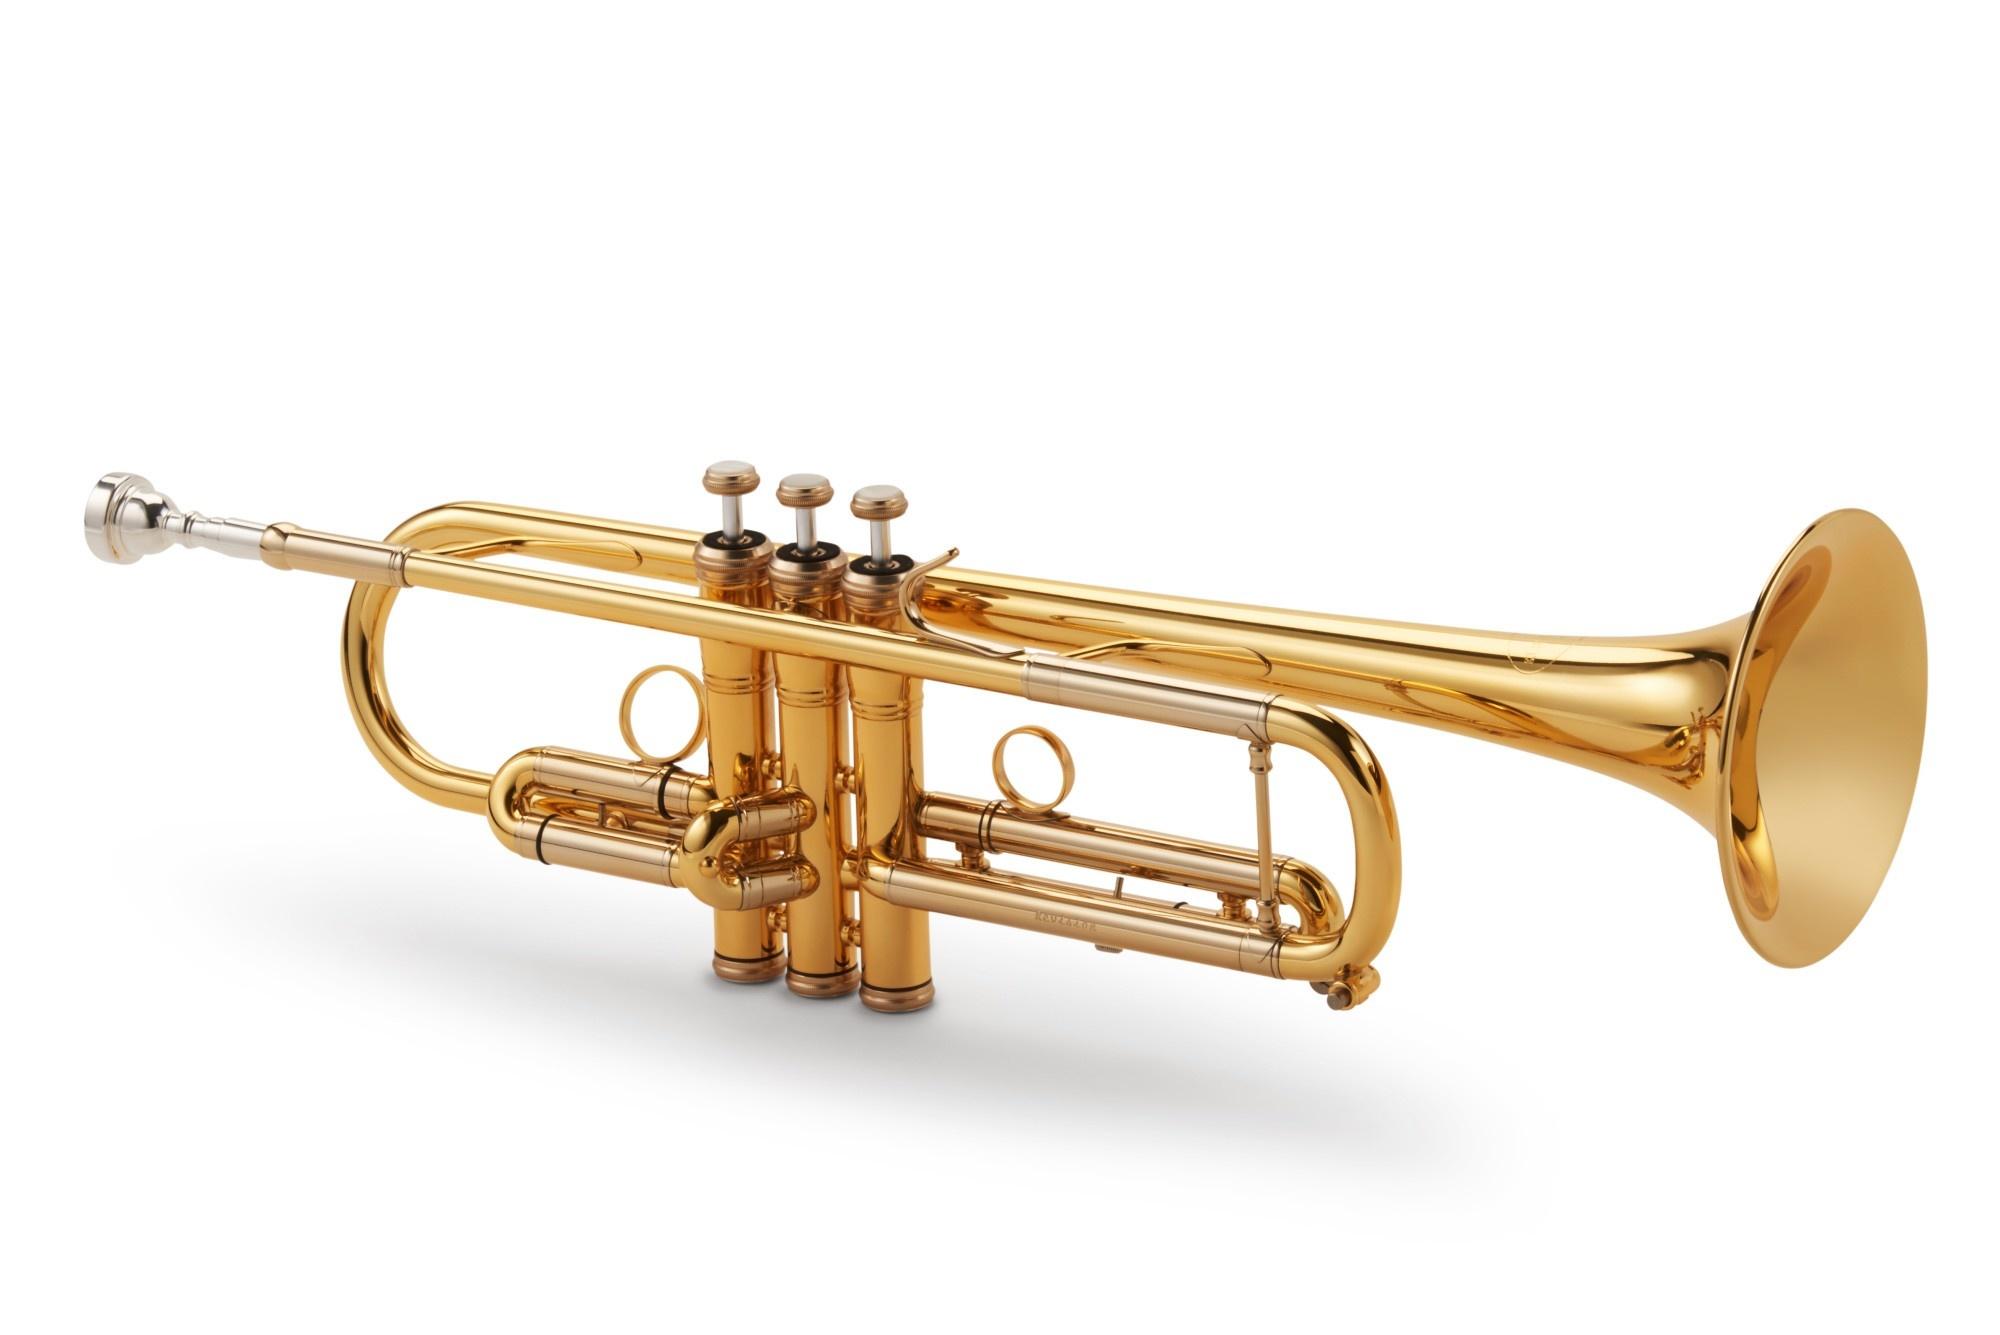 Kuhnl & Hoyer Revision trumpet